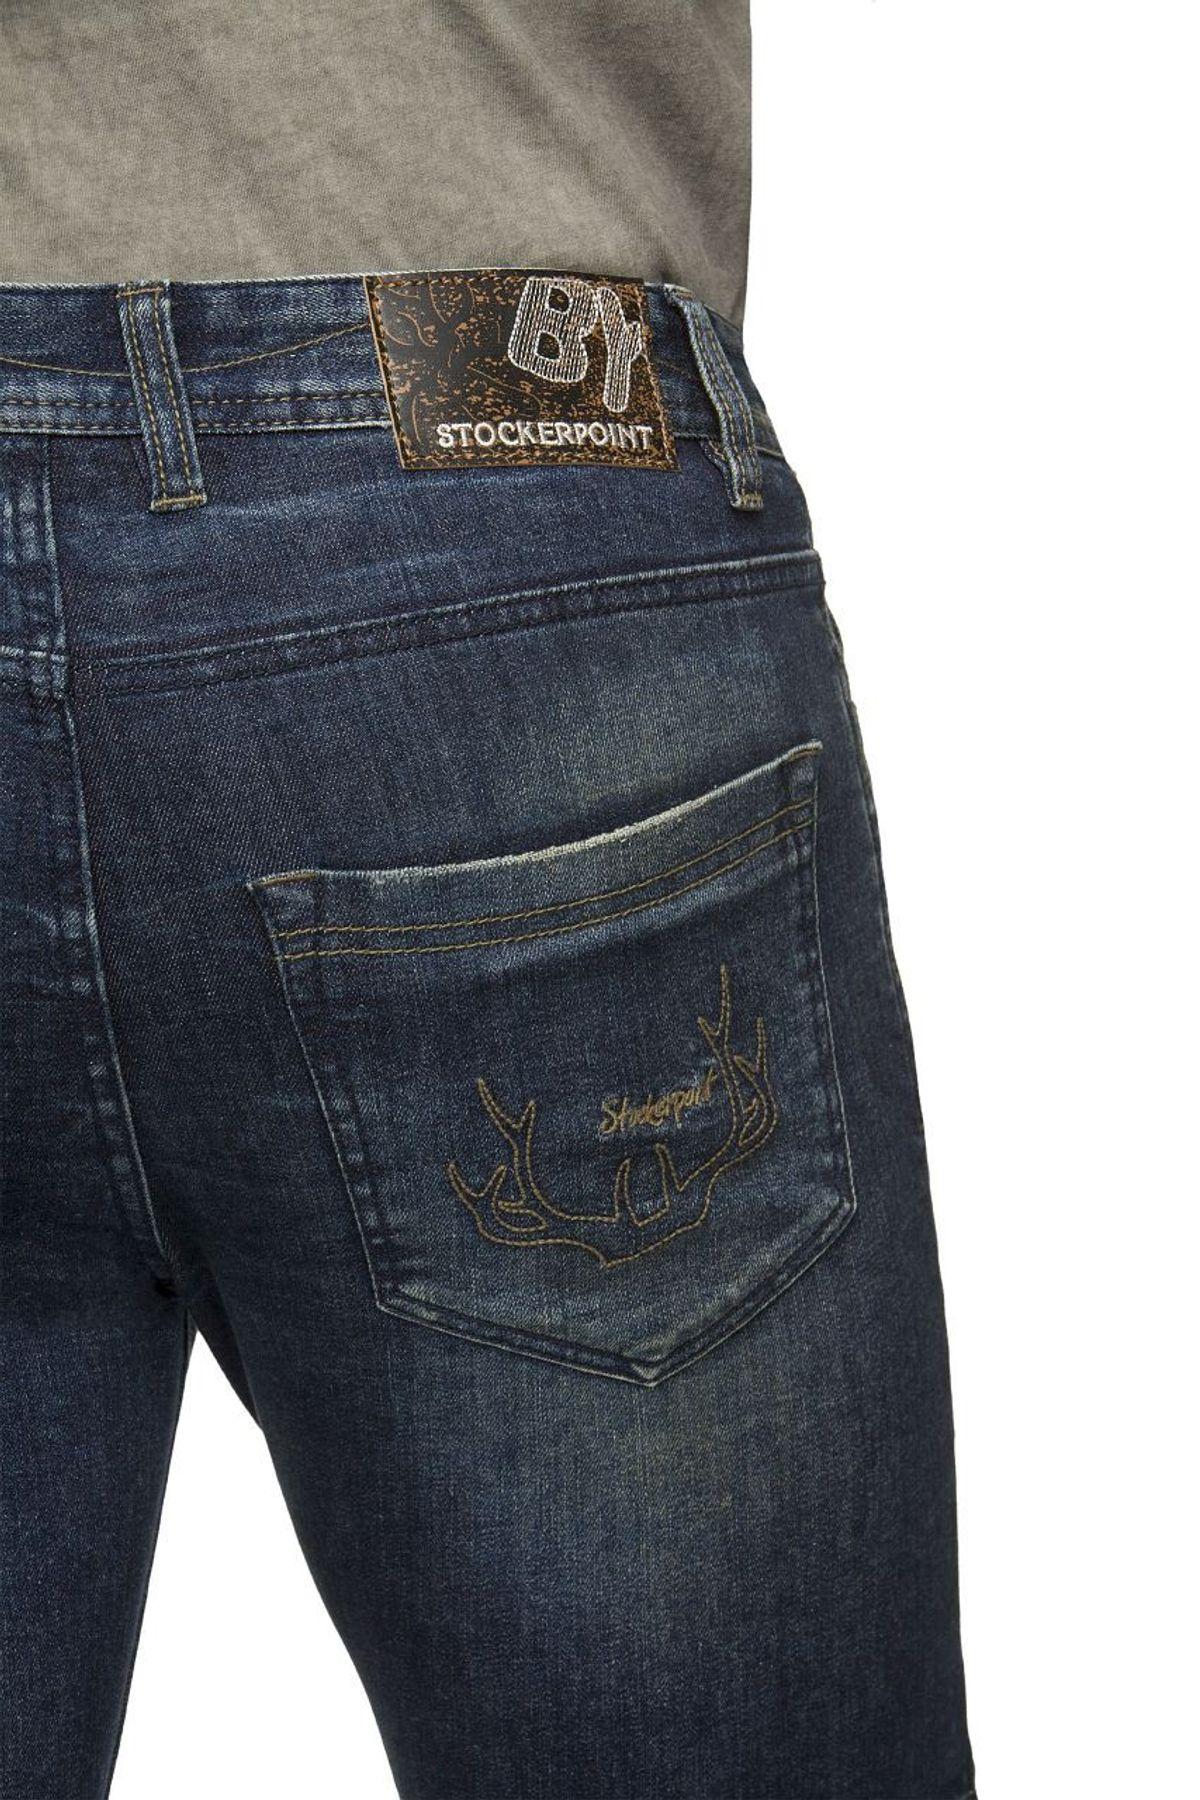 Stockerpoint - Herren Trachtenshort Jeans, Mick – Bild 5